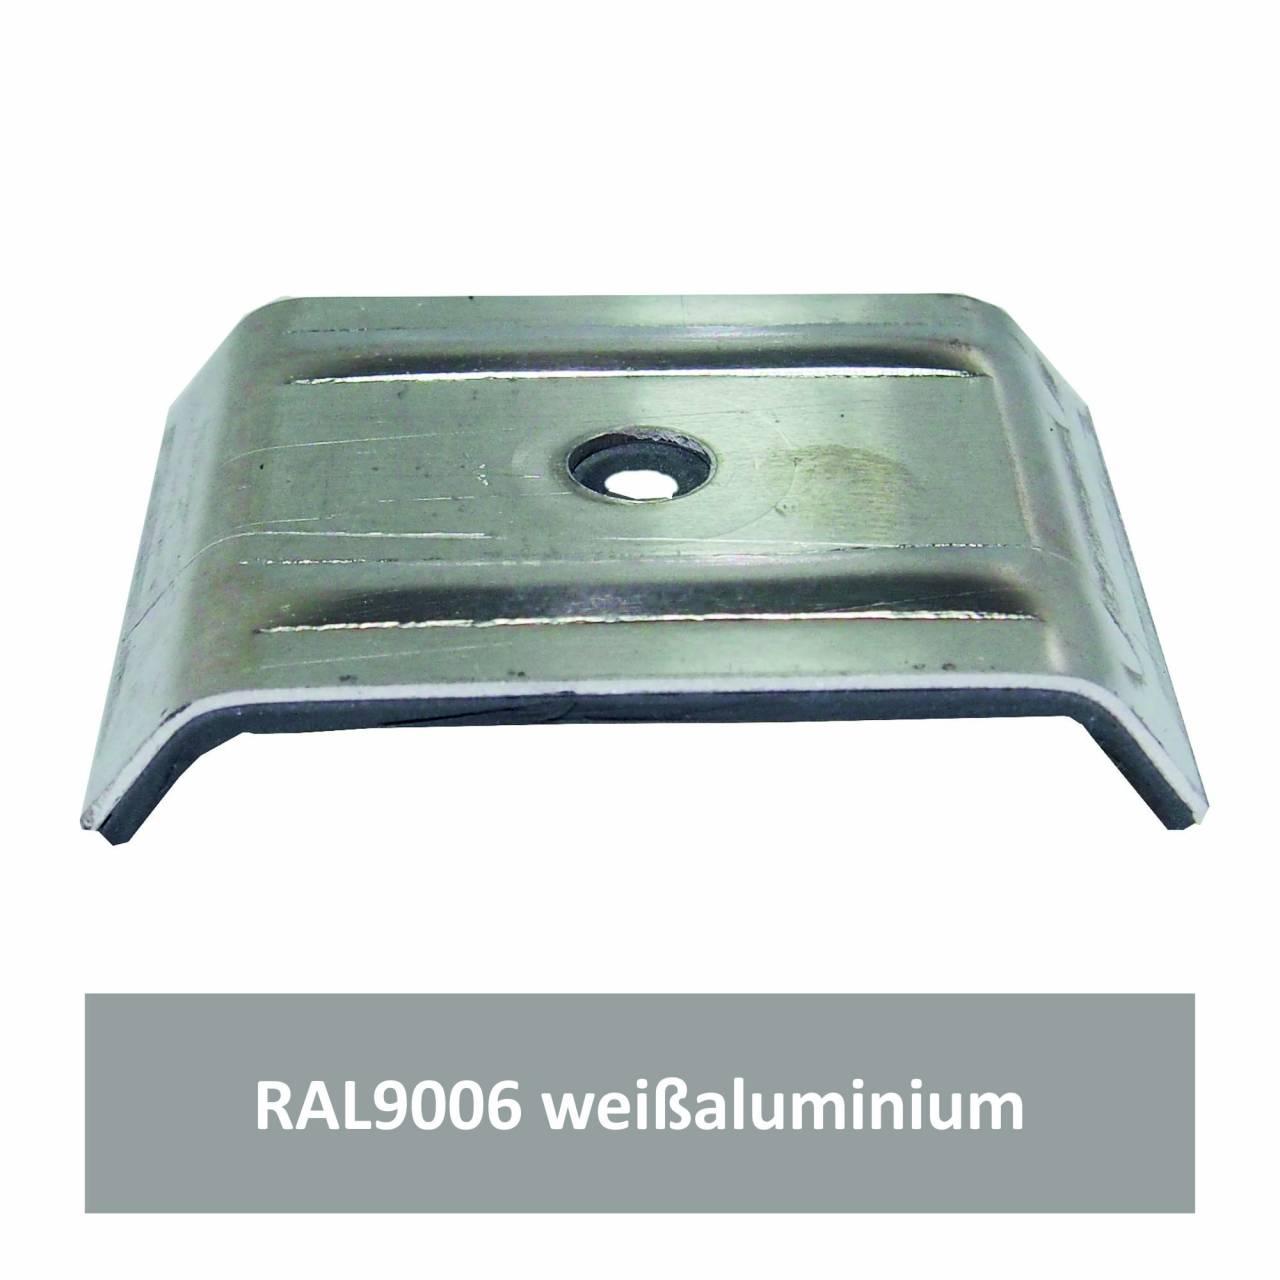 Kalotten für 35/207, Alu RAL9006 weißaluminium / Pck a 100 Stück